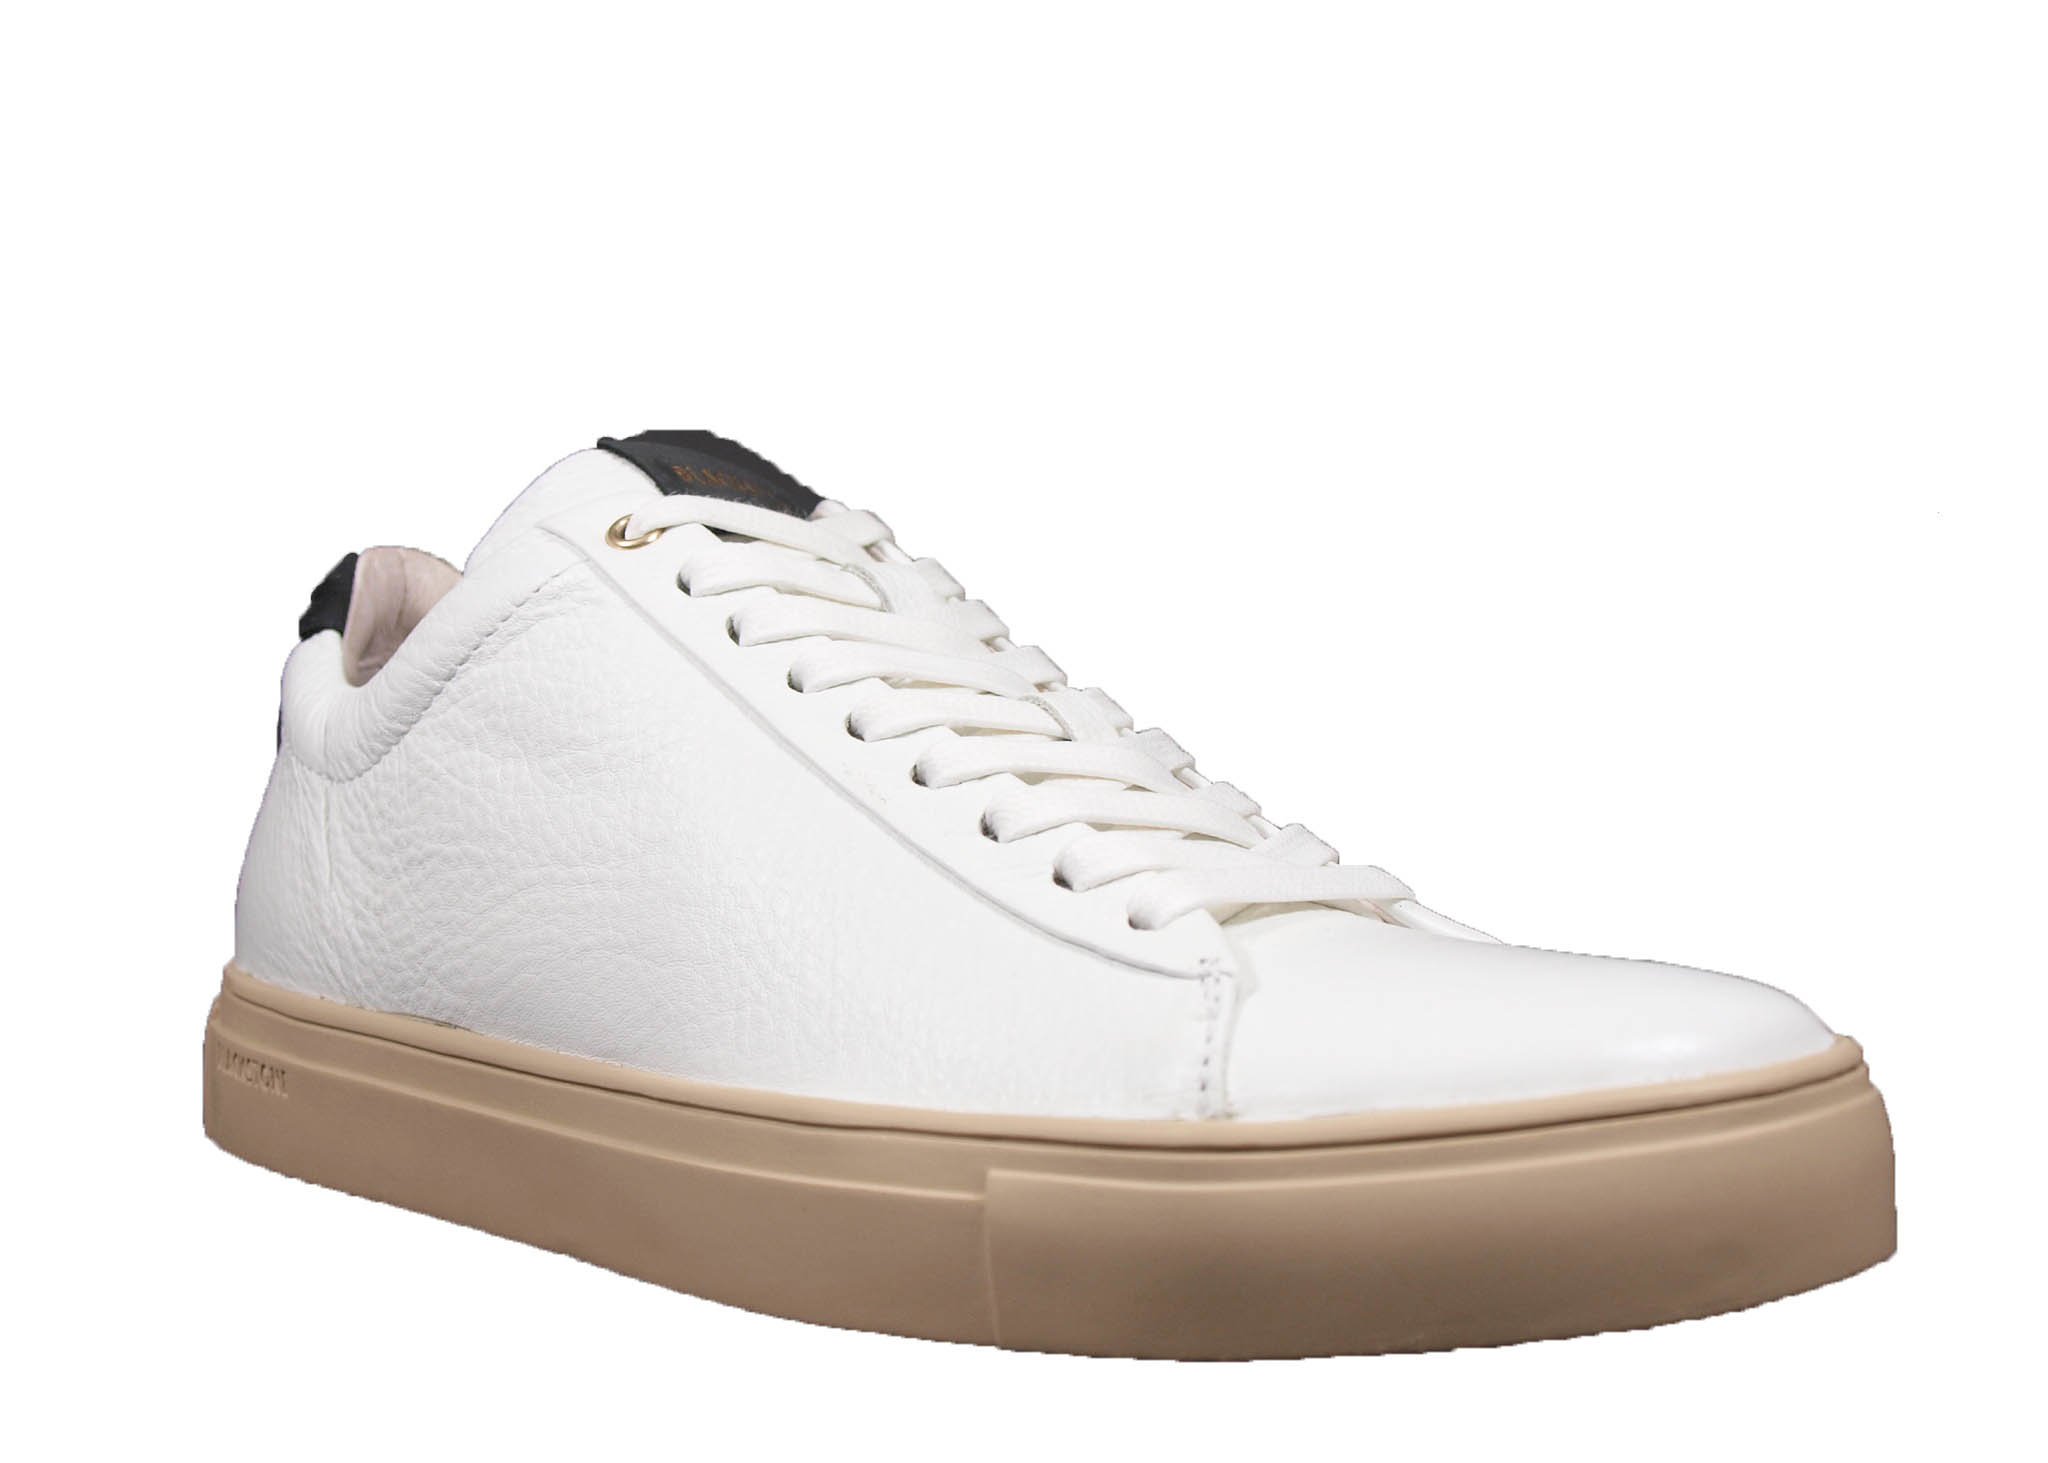 blackstone heren Blackstone Sneaker VG02 Wit/ Zwart Leer